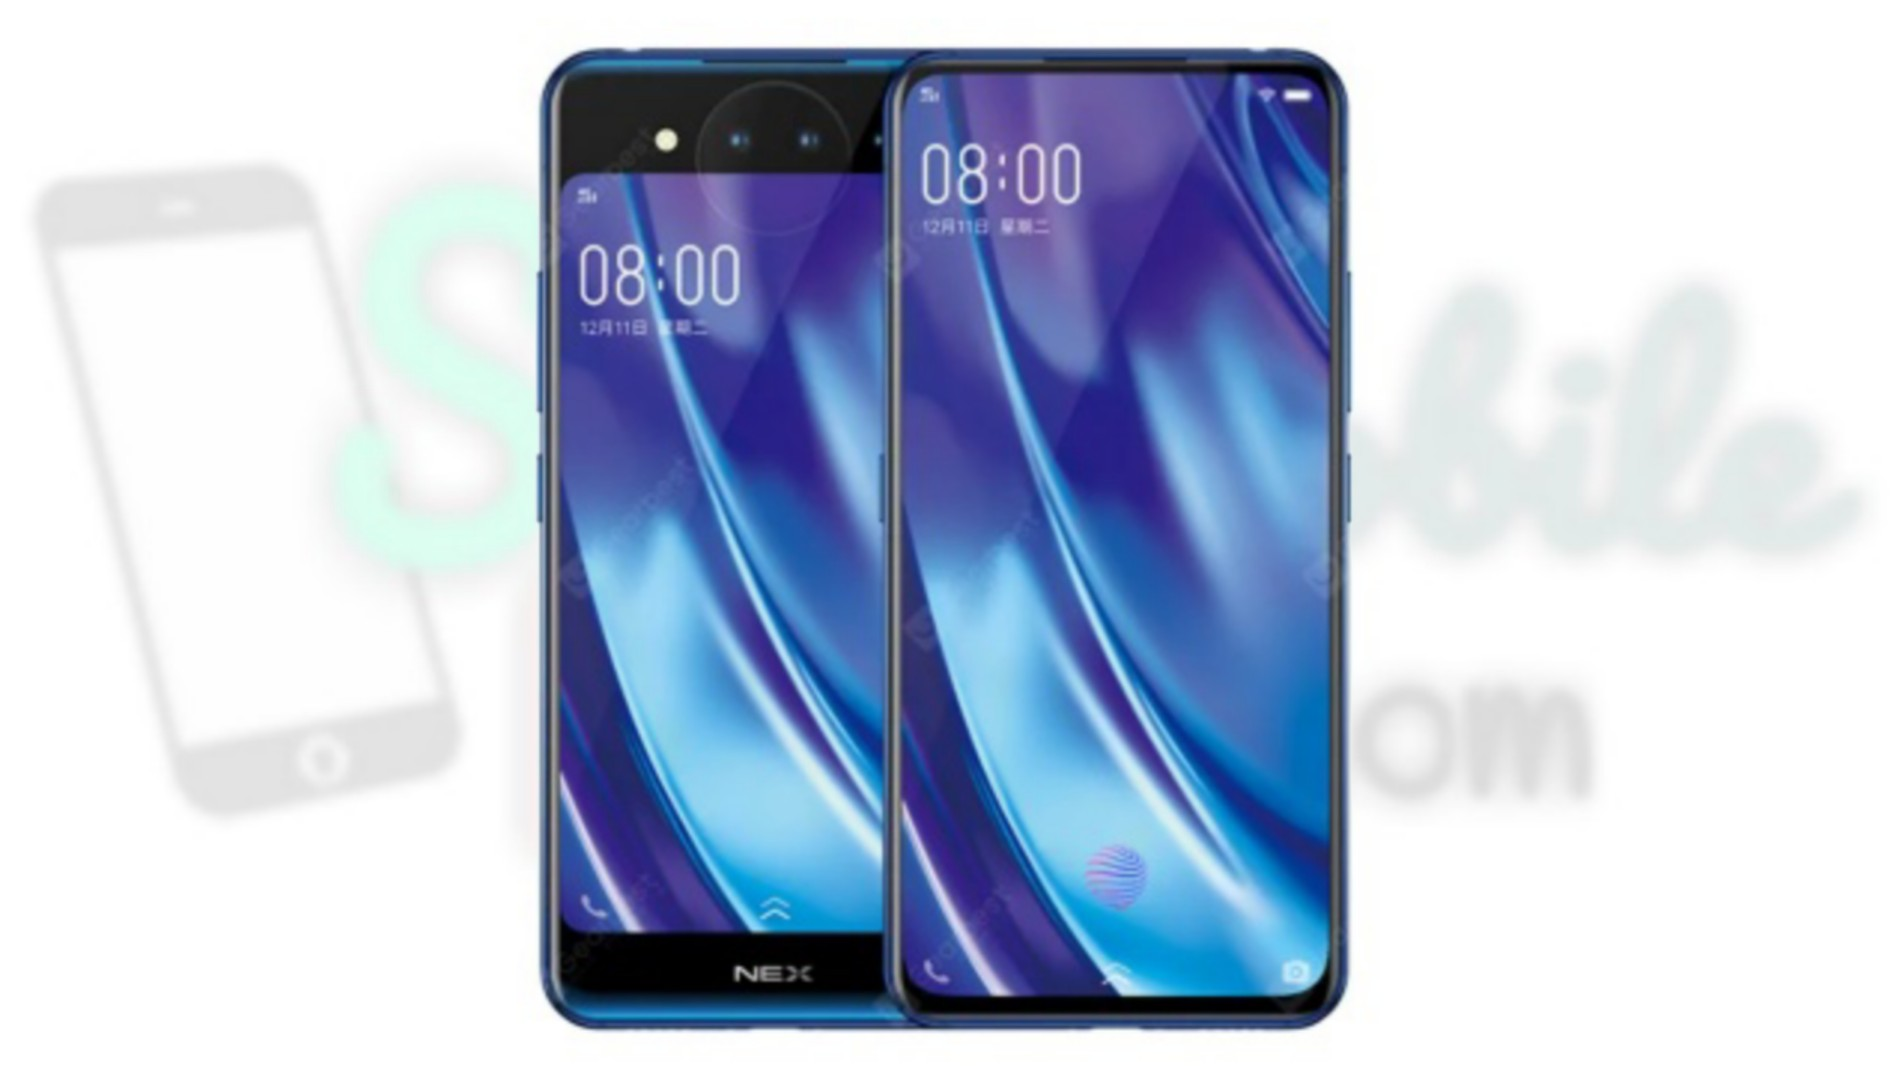 Vivo NEX Dual Display Specifications and Price